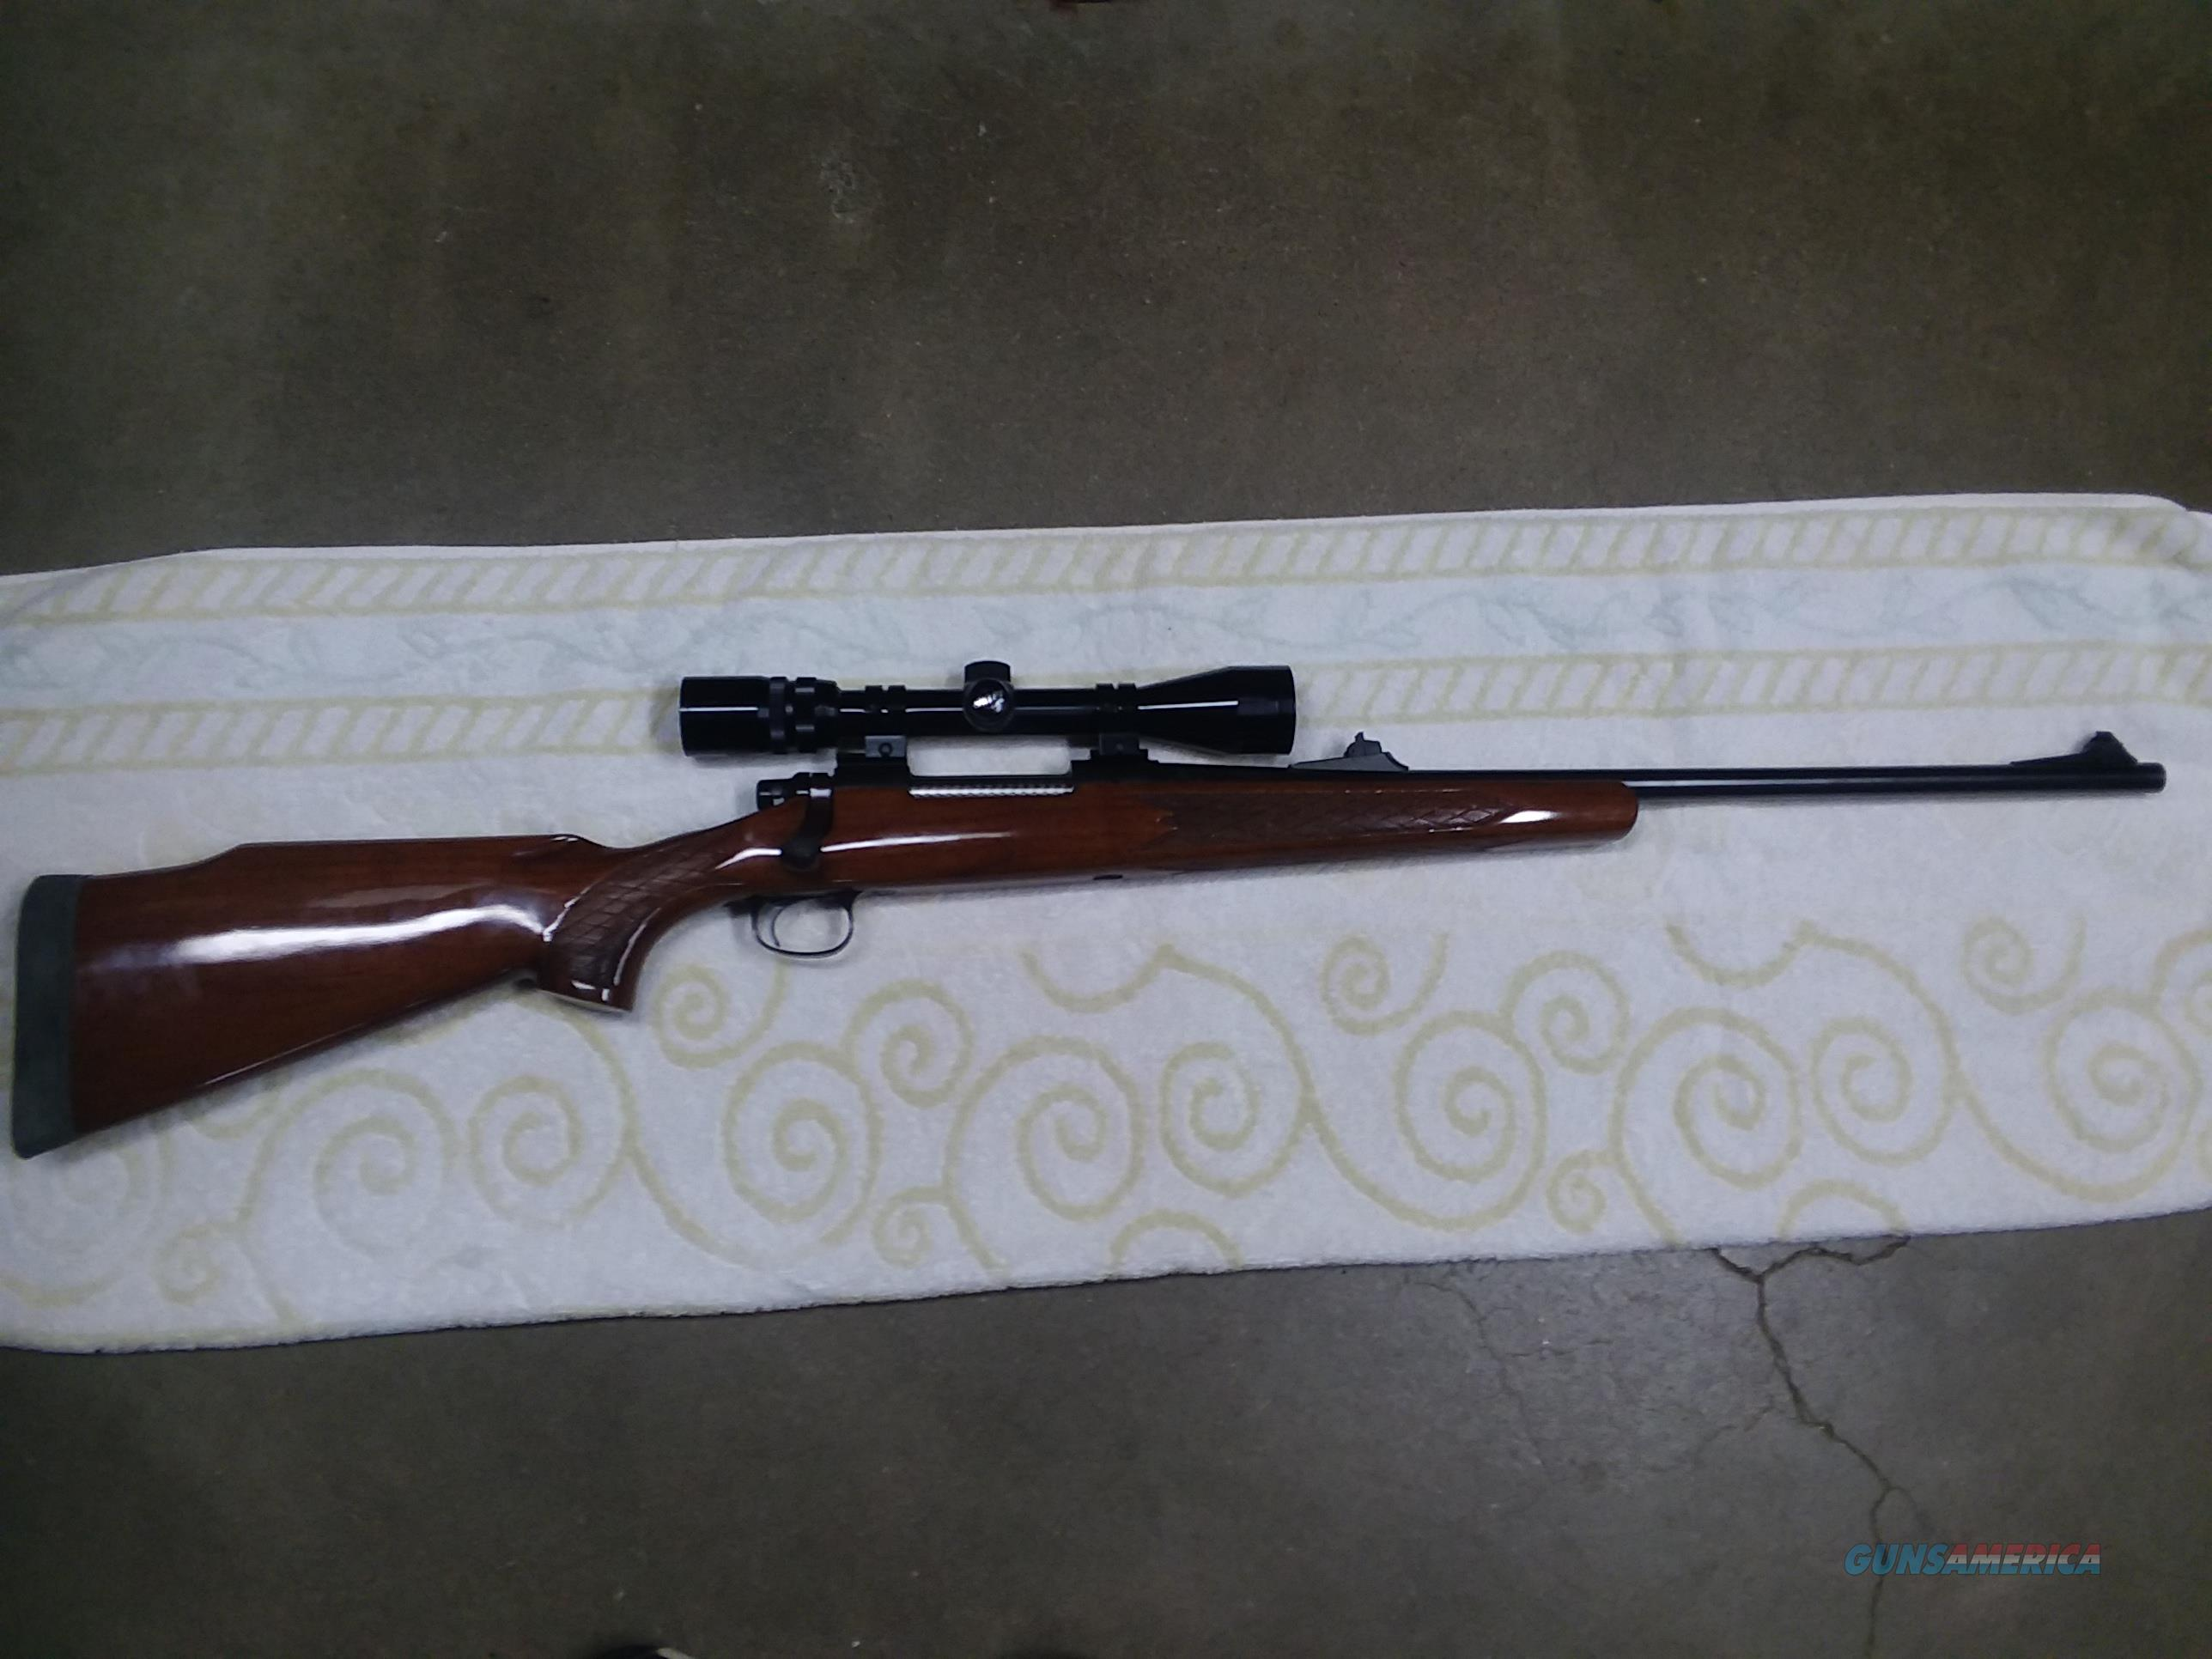 Remington 700 ADL Deluxe .30-06  Guns > Rifles > Remington Rifles - Modern > Model 700 > Sporting